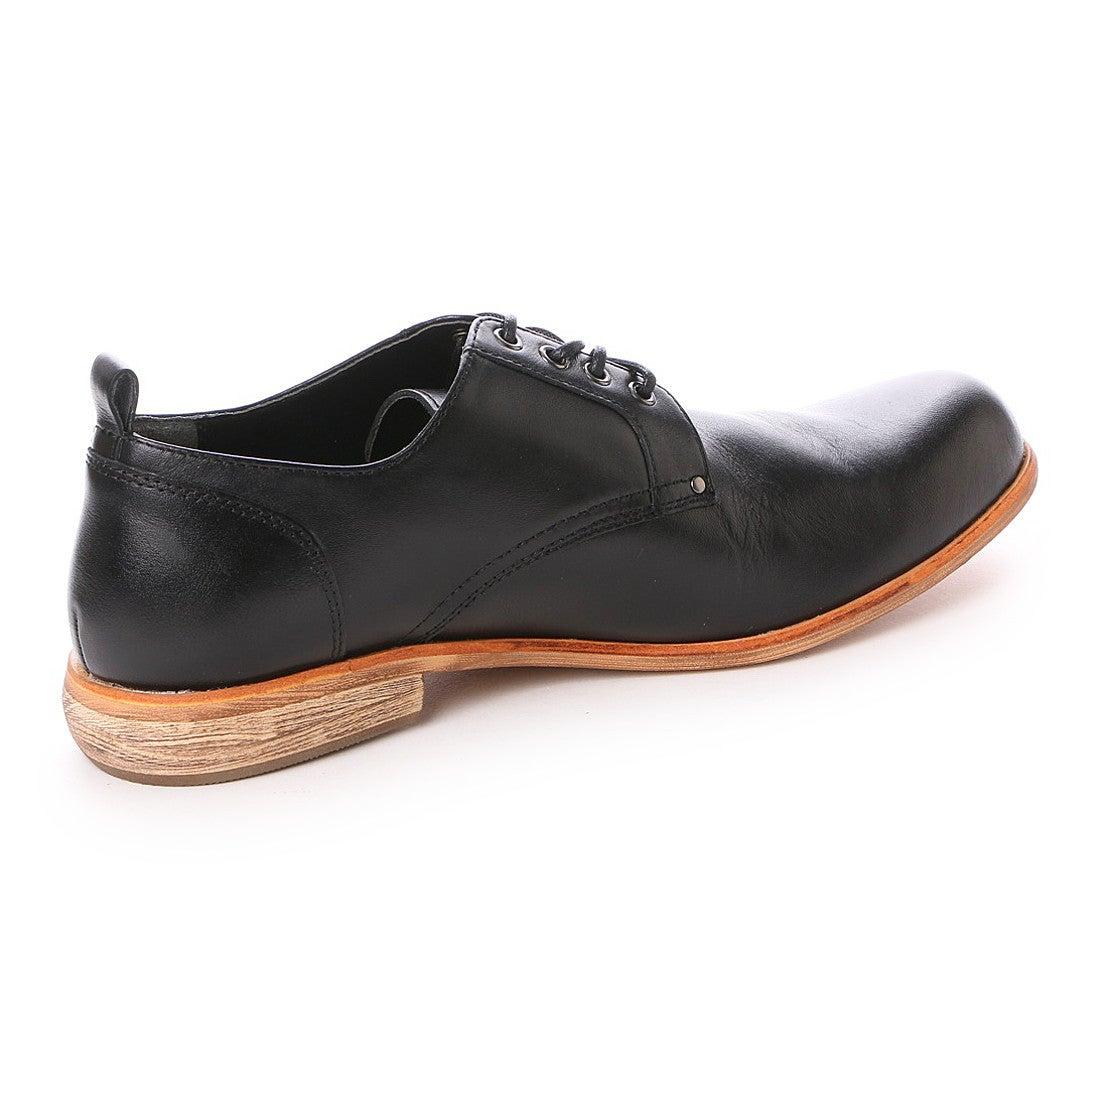 ASBee リー Lee メンズ 本革カジュアルシューズ(オックスフォードシューズ) 52440 (ブラック) ,靴とファッションの通販サイト ロコンド